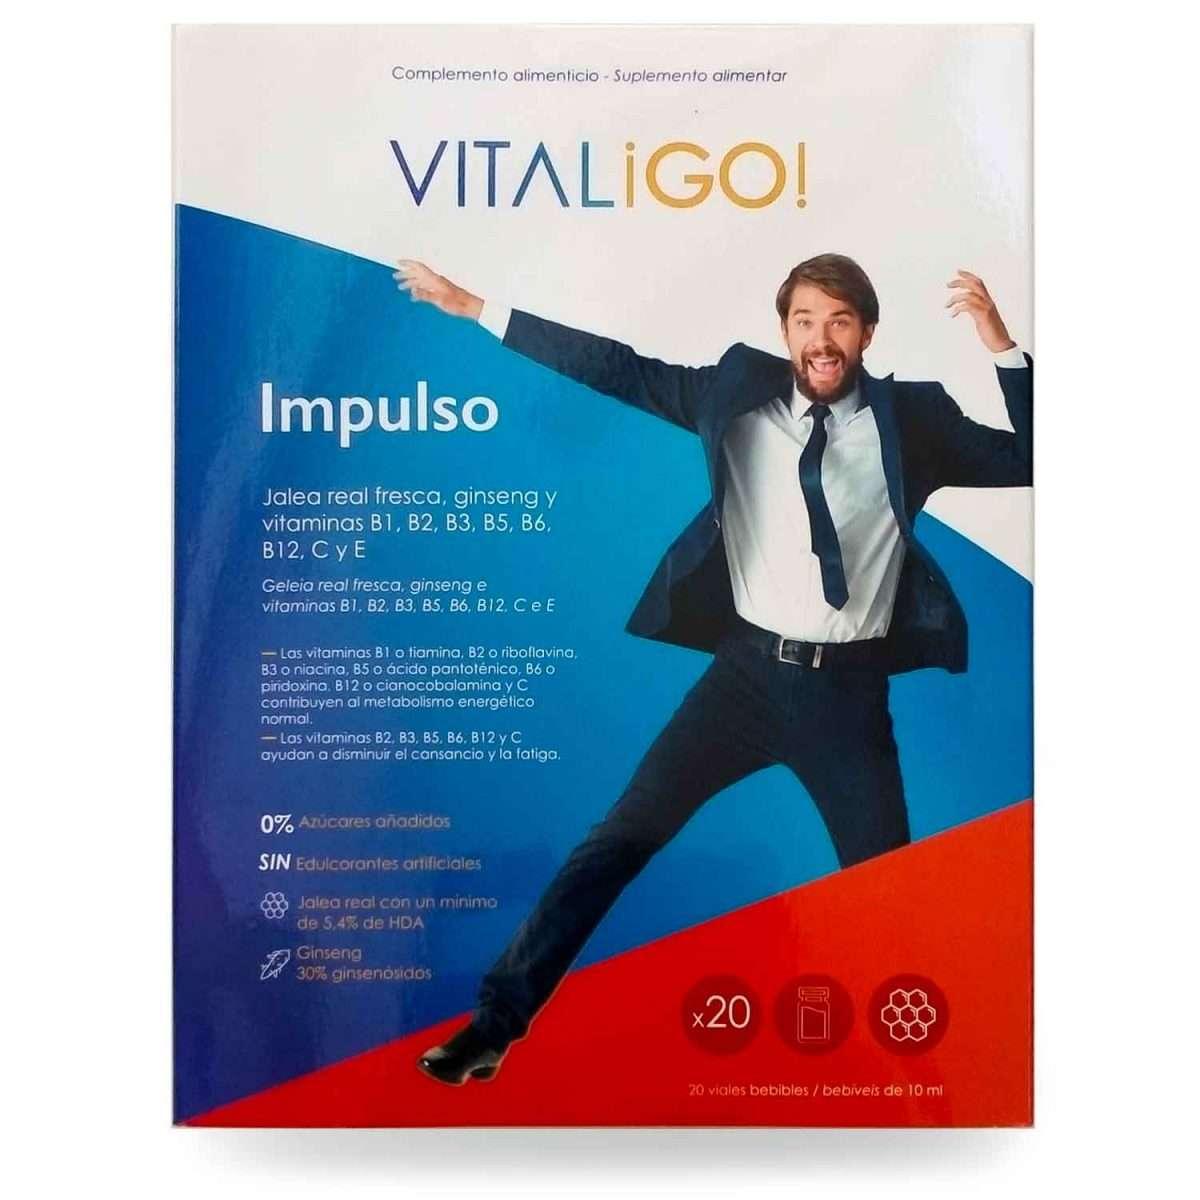 Impulso Jalea y Vitaminas VitaliGo 20 viales